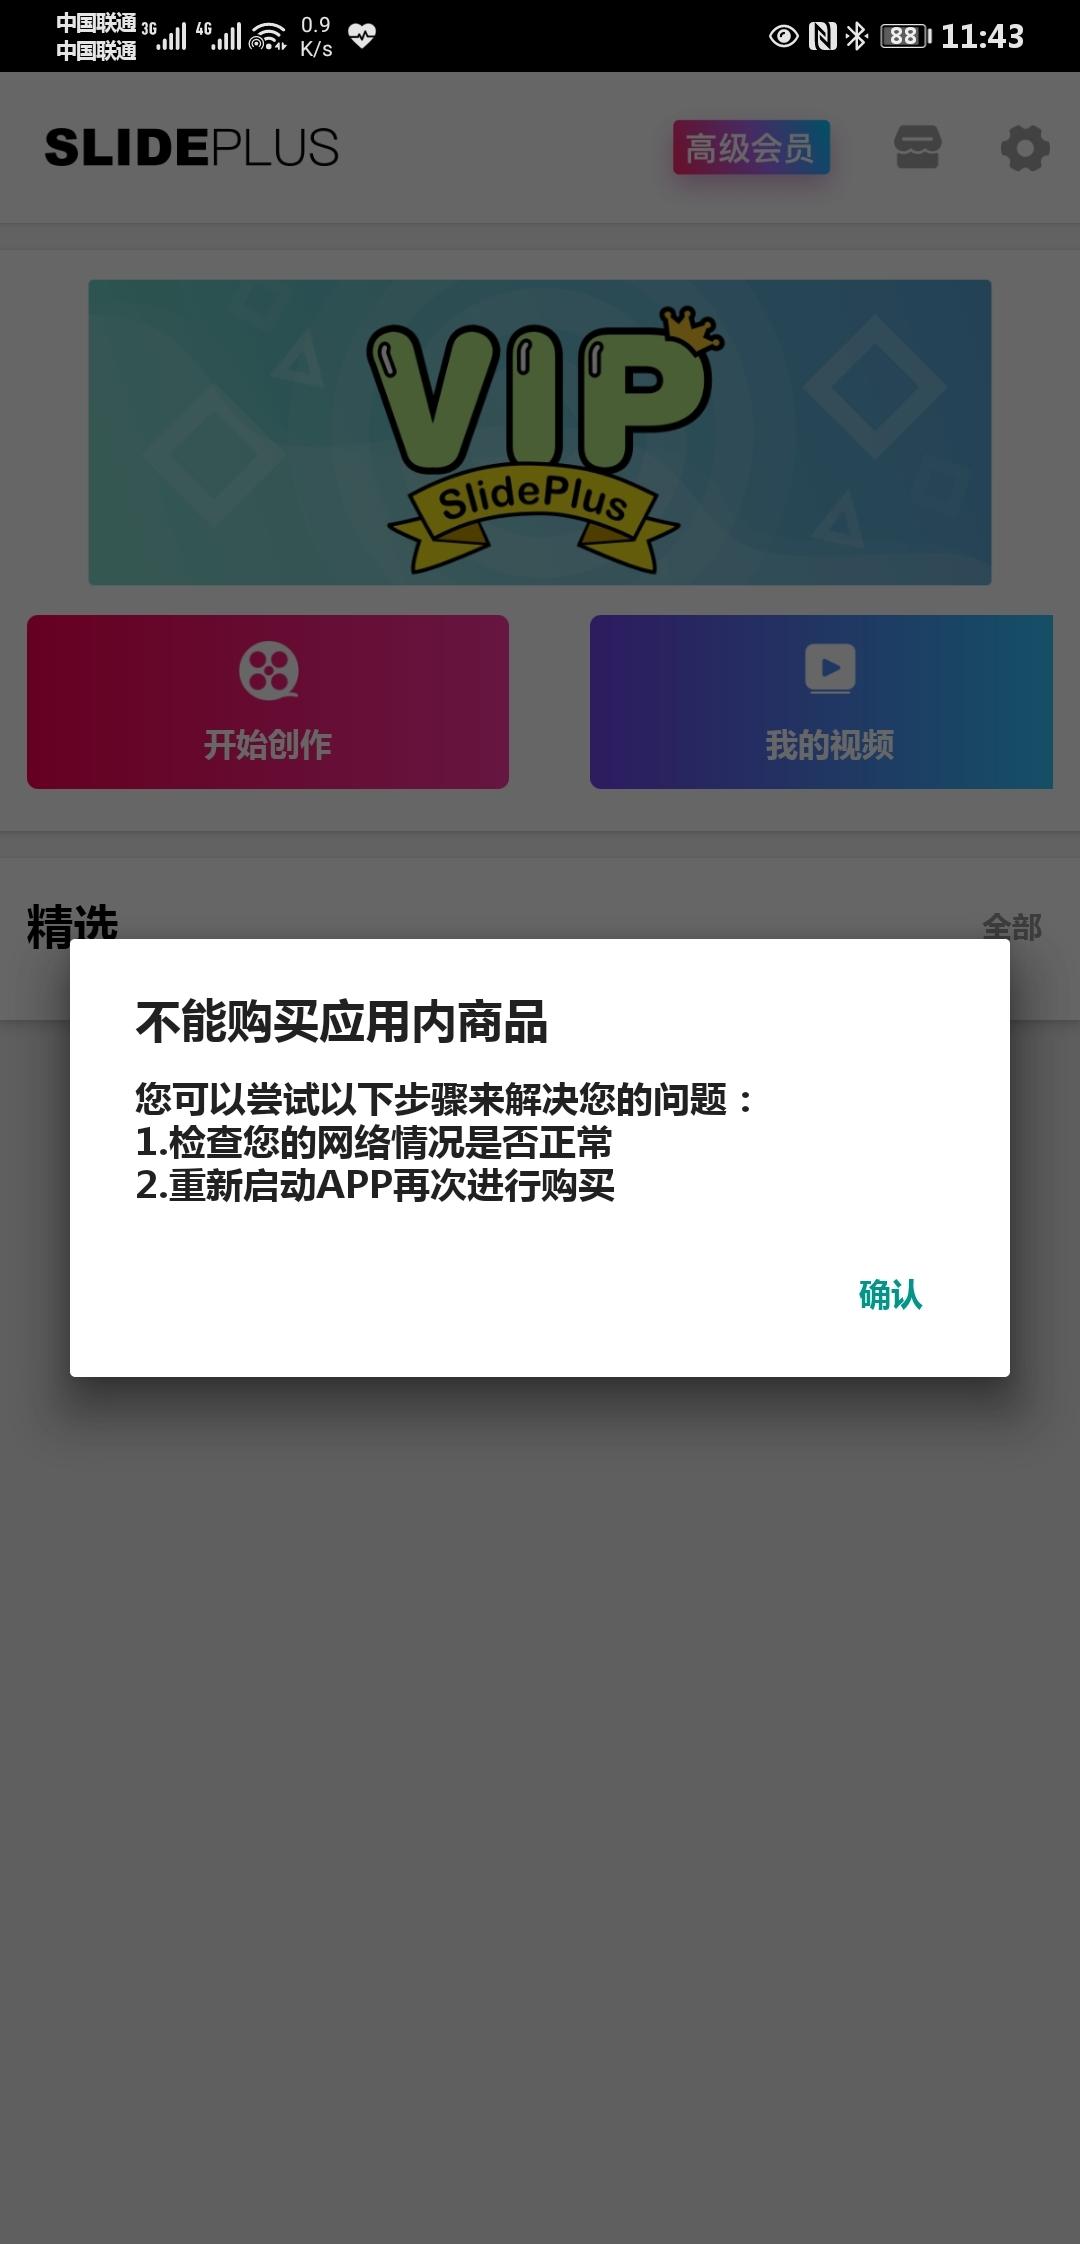 Screenshot_20201118_114335_com.quvideo.slideplus.jpg